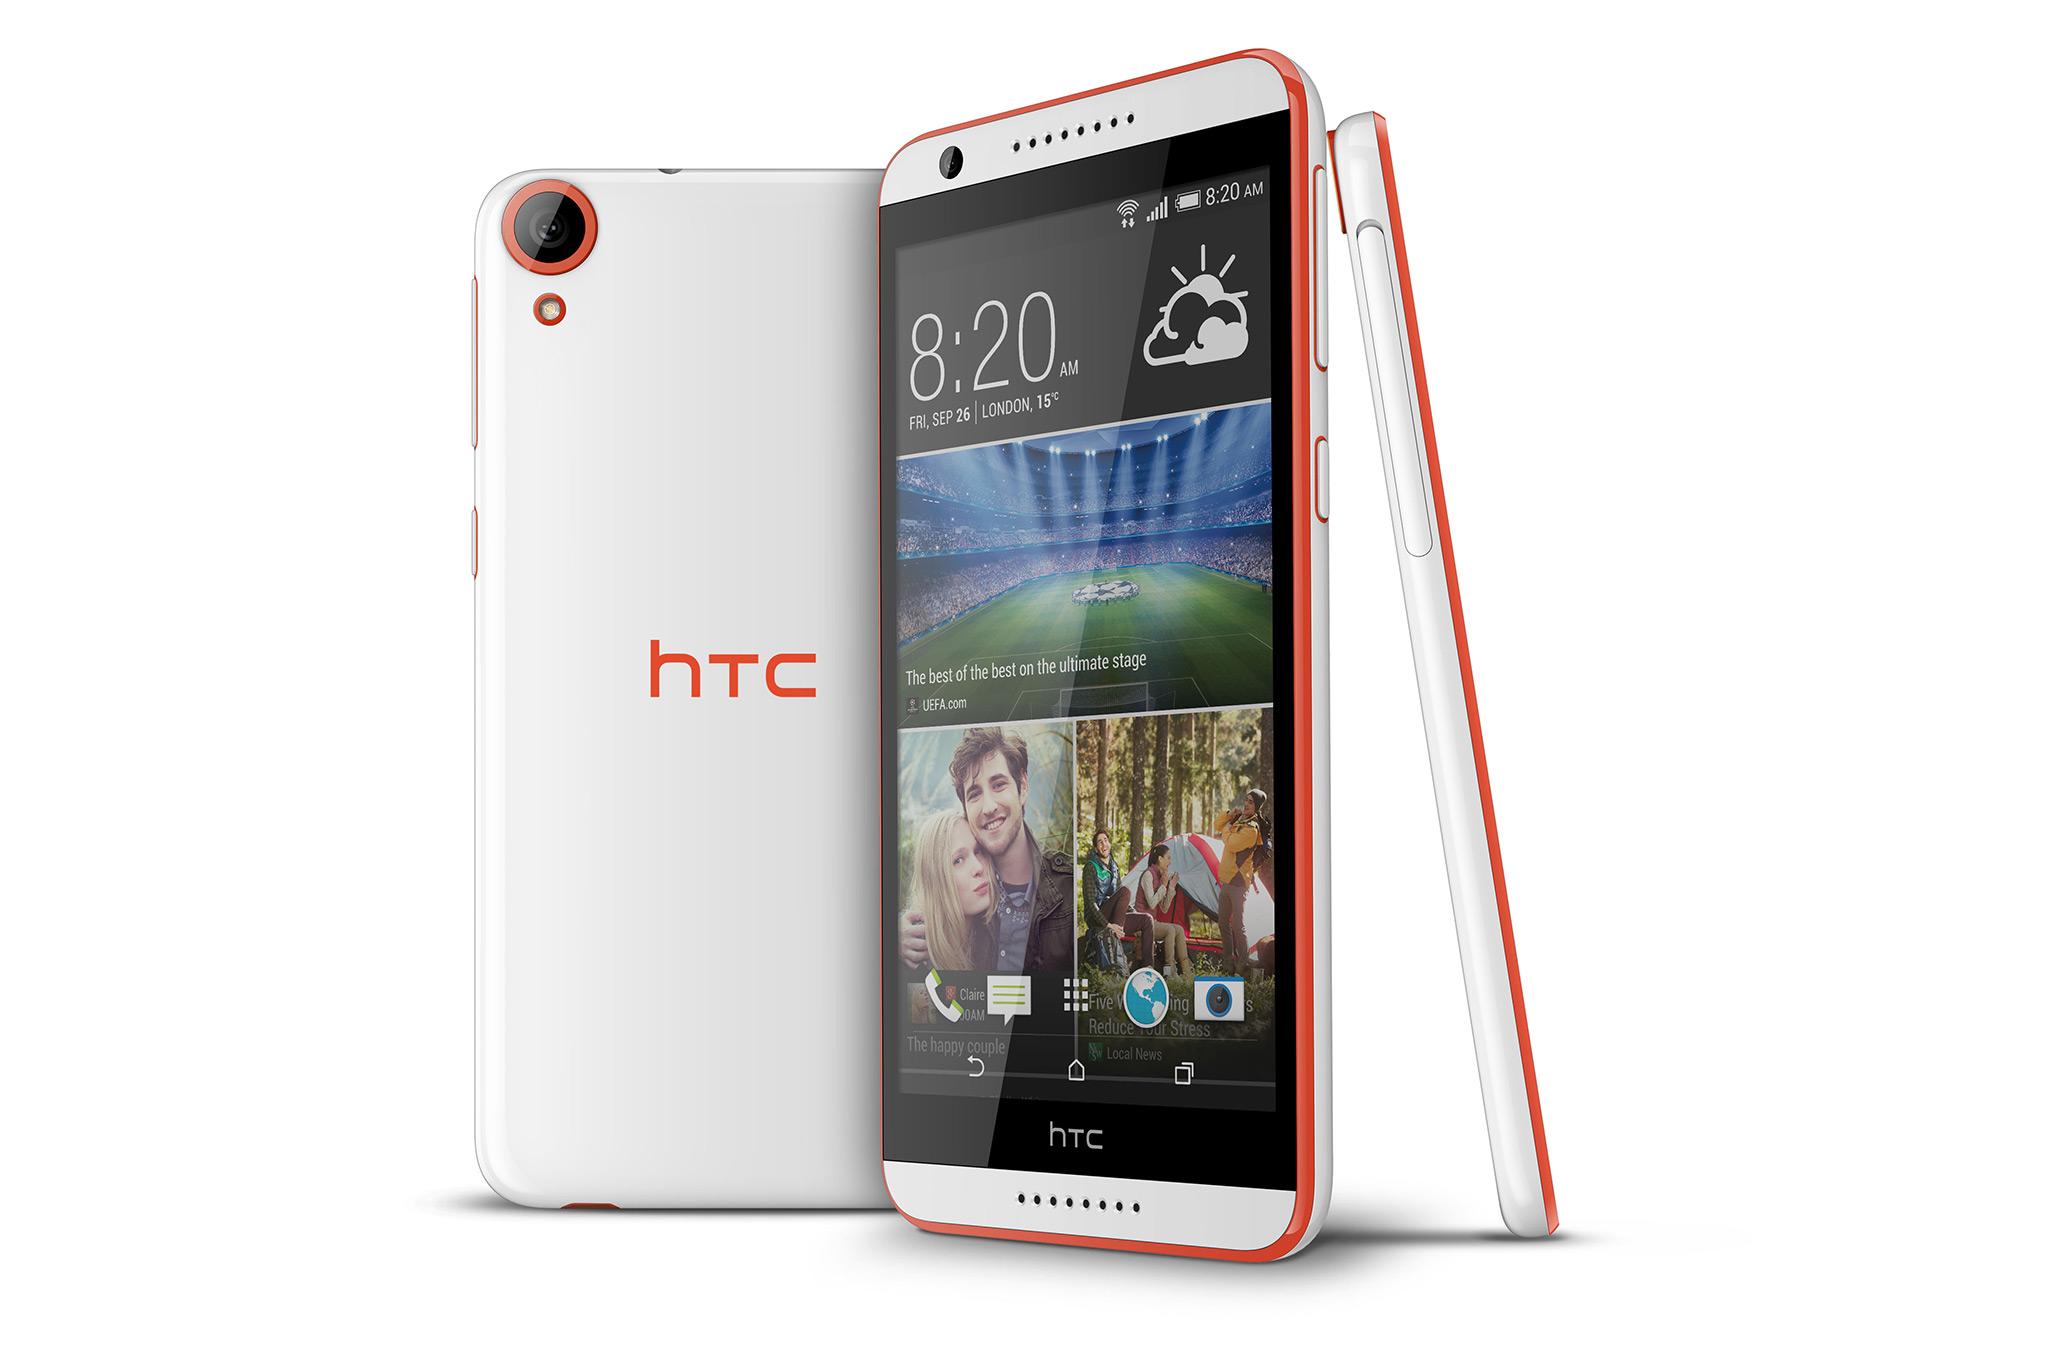 htc-desire-820-040914-2